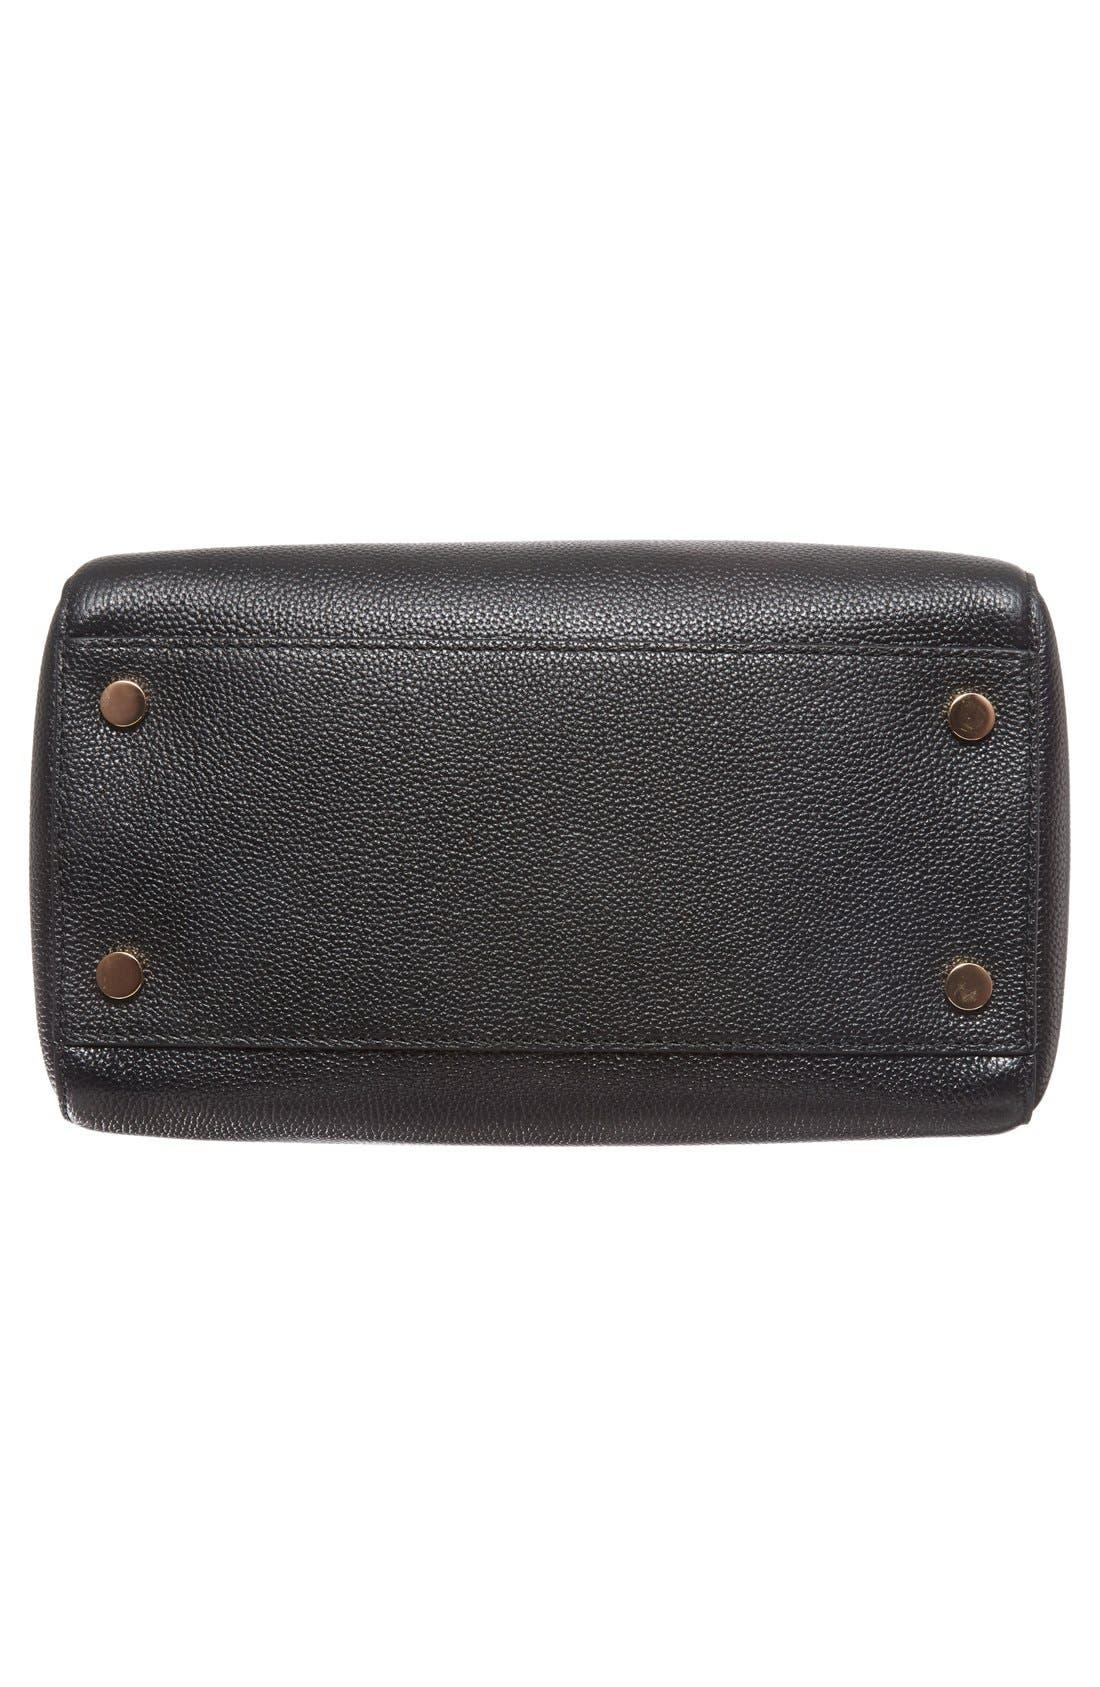 Medium Mercer Duffel Bag,                             Alternate thumbnail 6, color,                             Black/ Gold